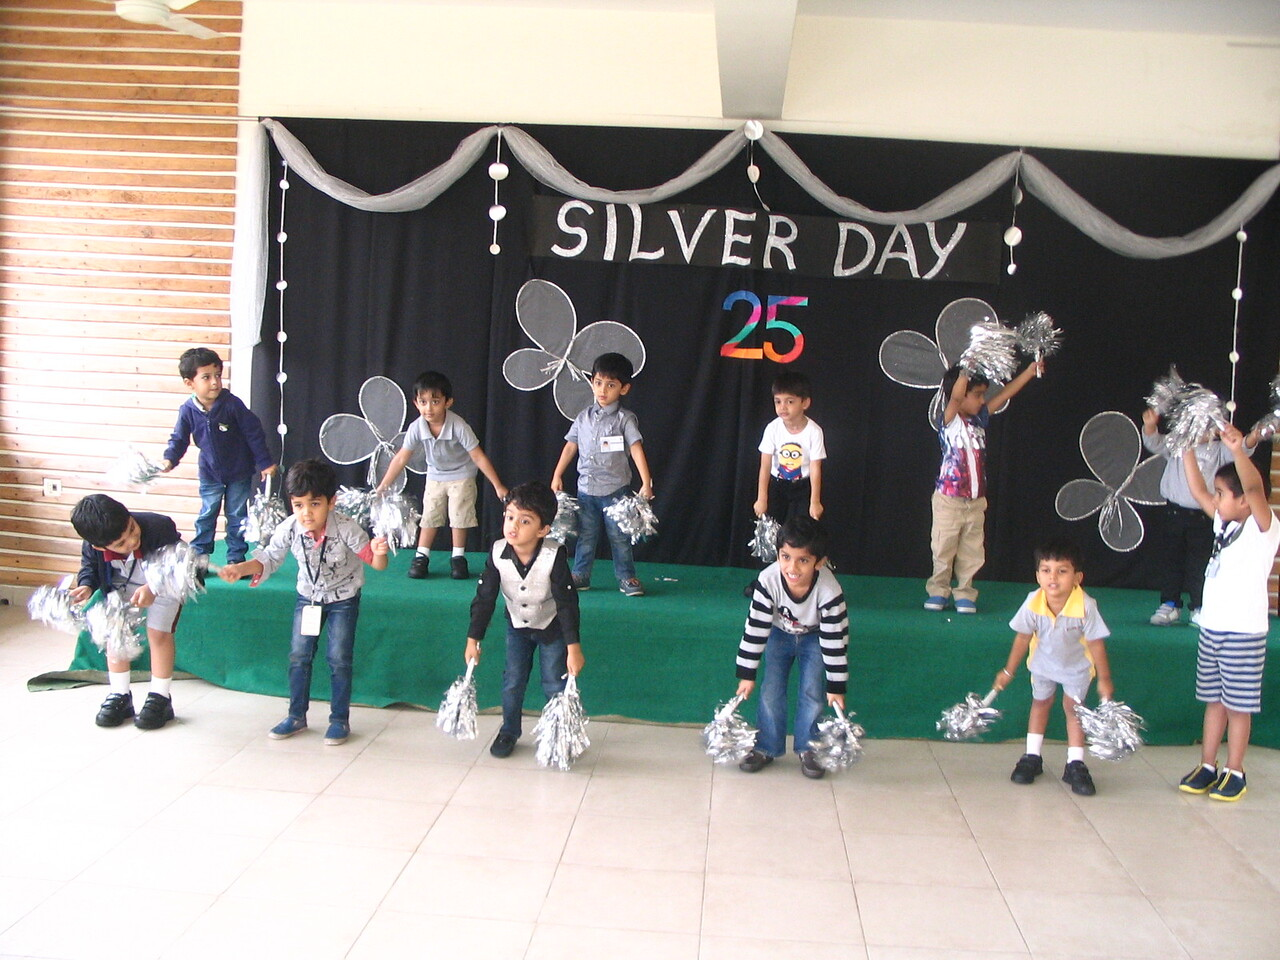 SILVER DAY CELEBRATIONS3